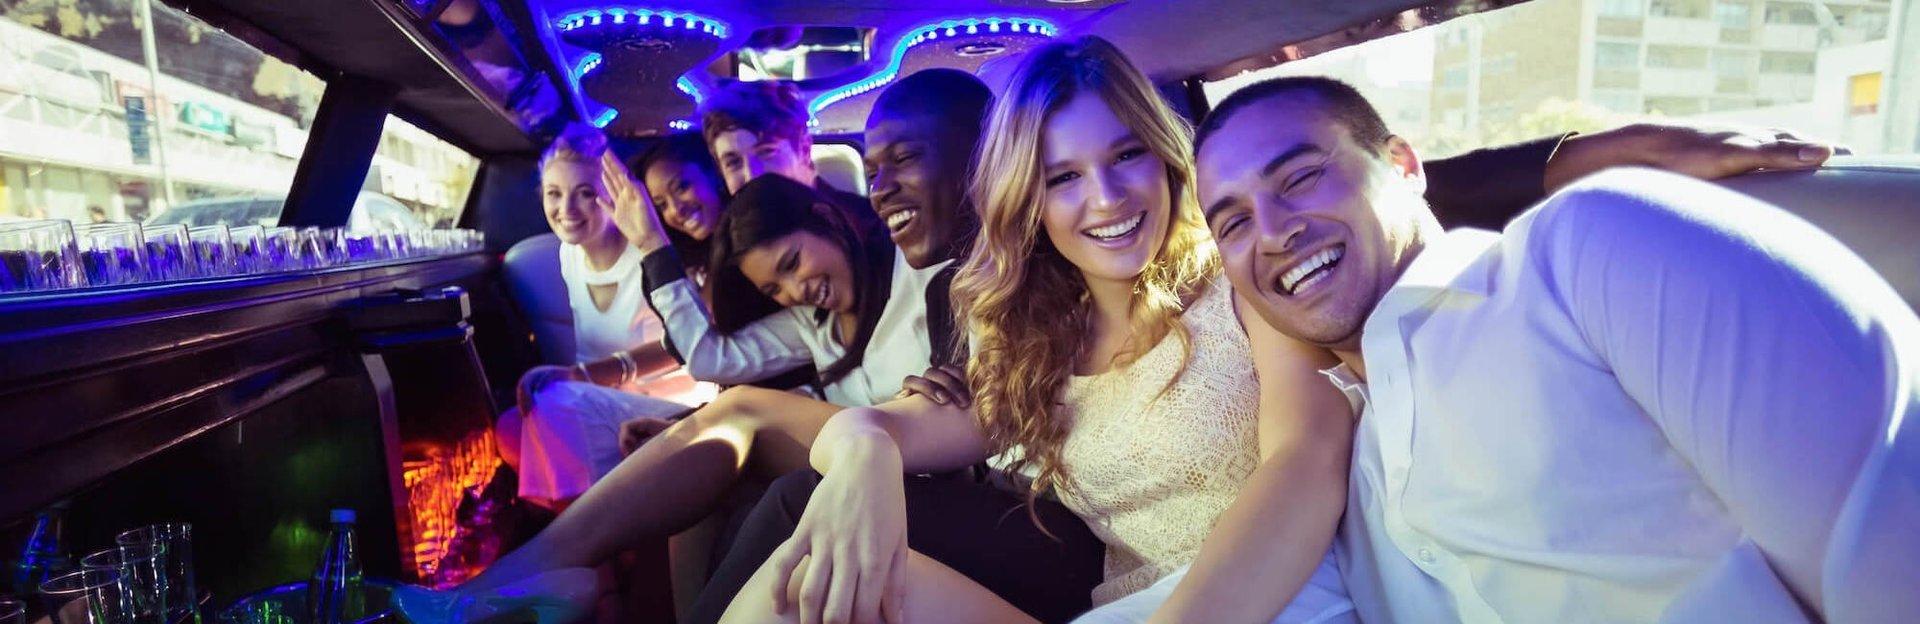 limo service in San Diego testimonials